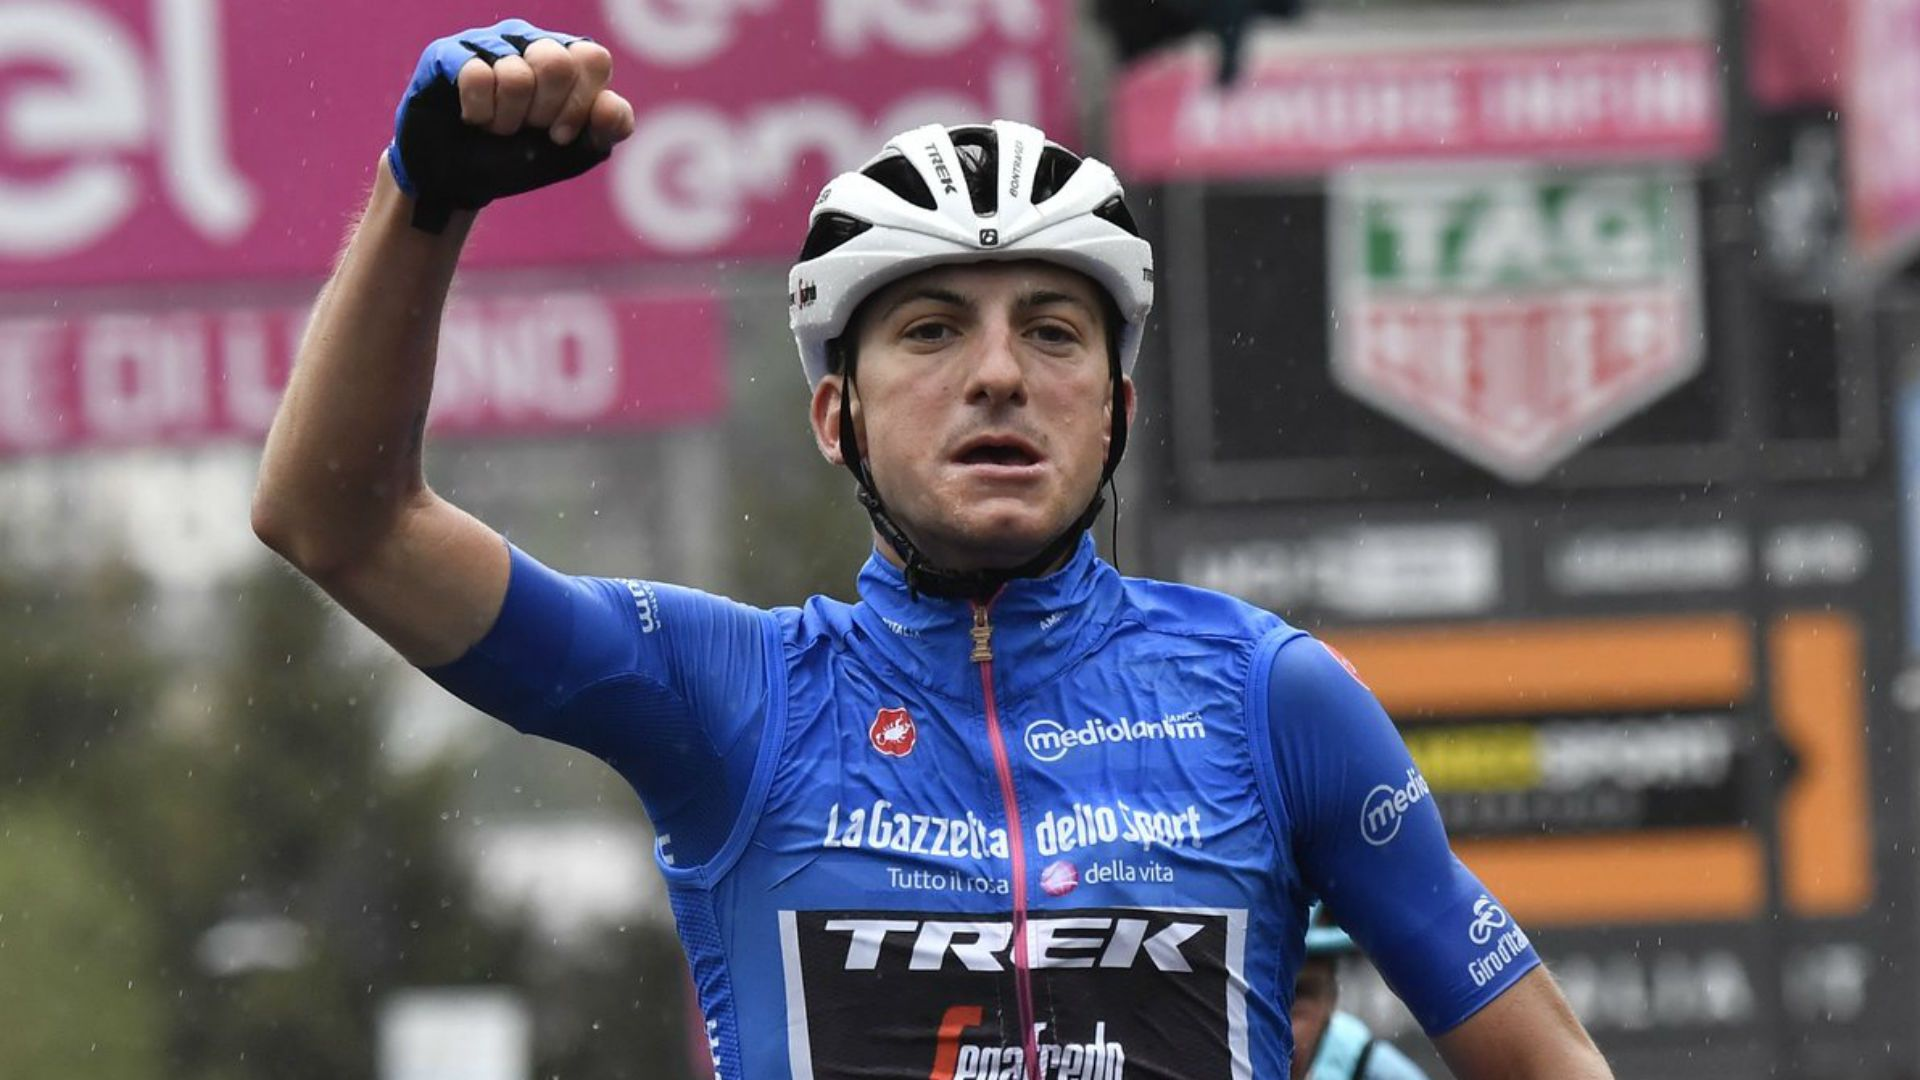 2019 Giro d'Italia Stage 16 Recap: Ciccone wins, Roglic and Yates lose more time 9